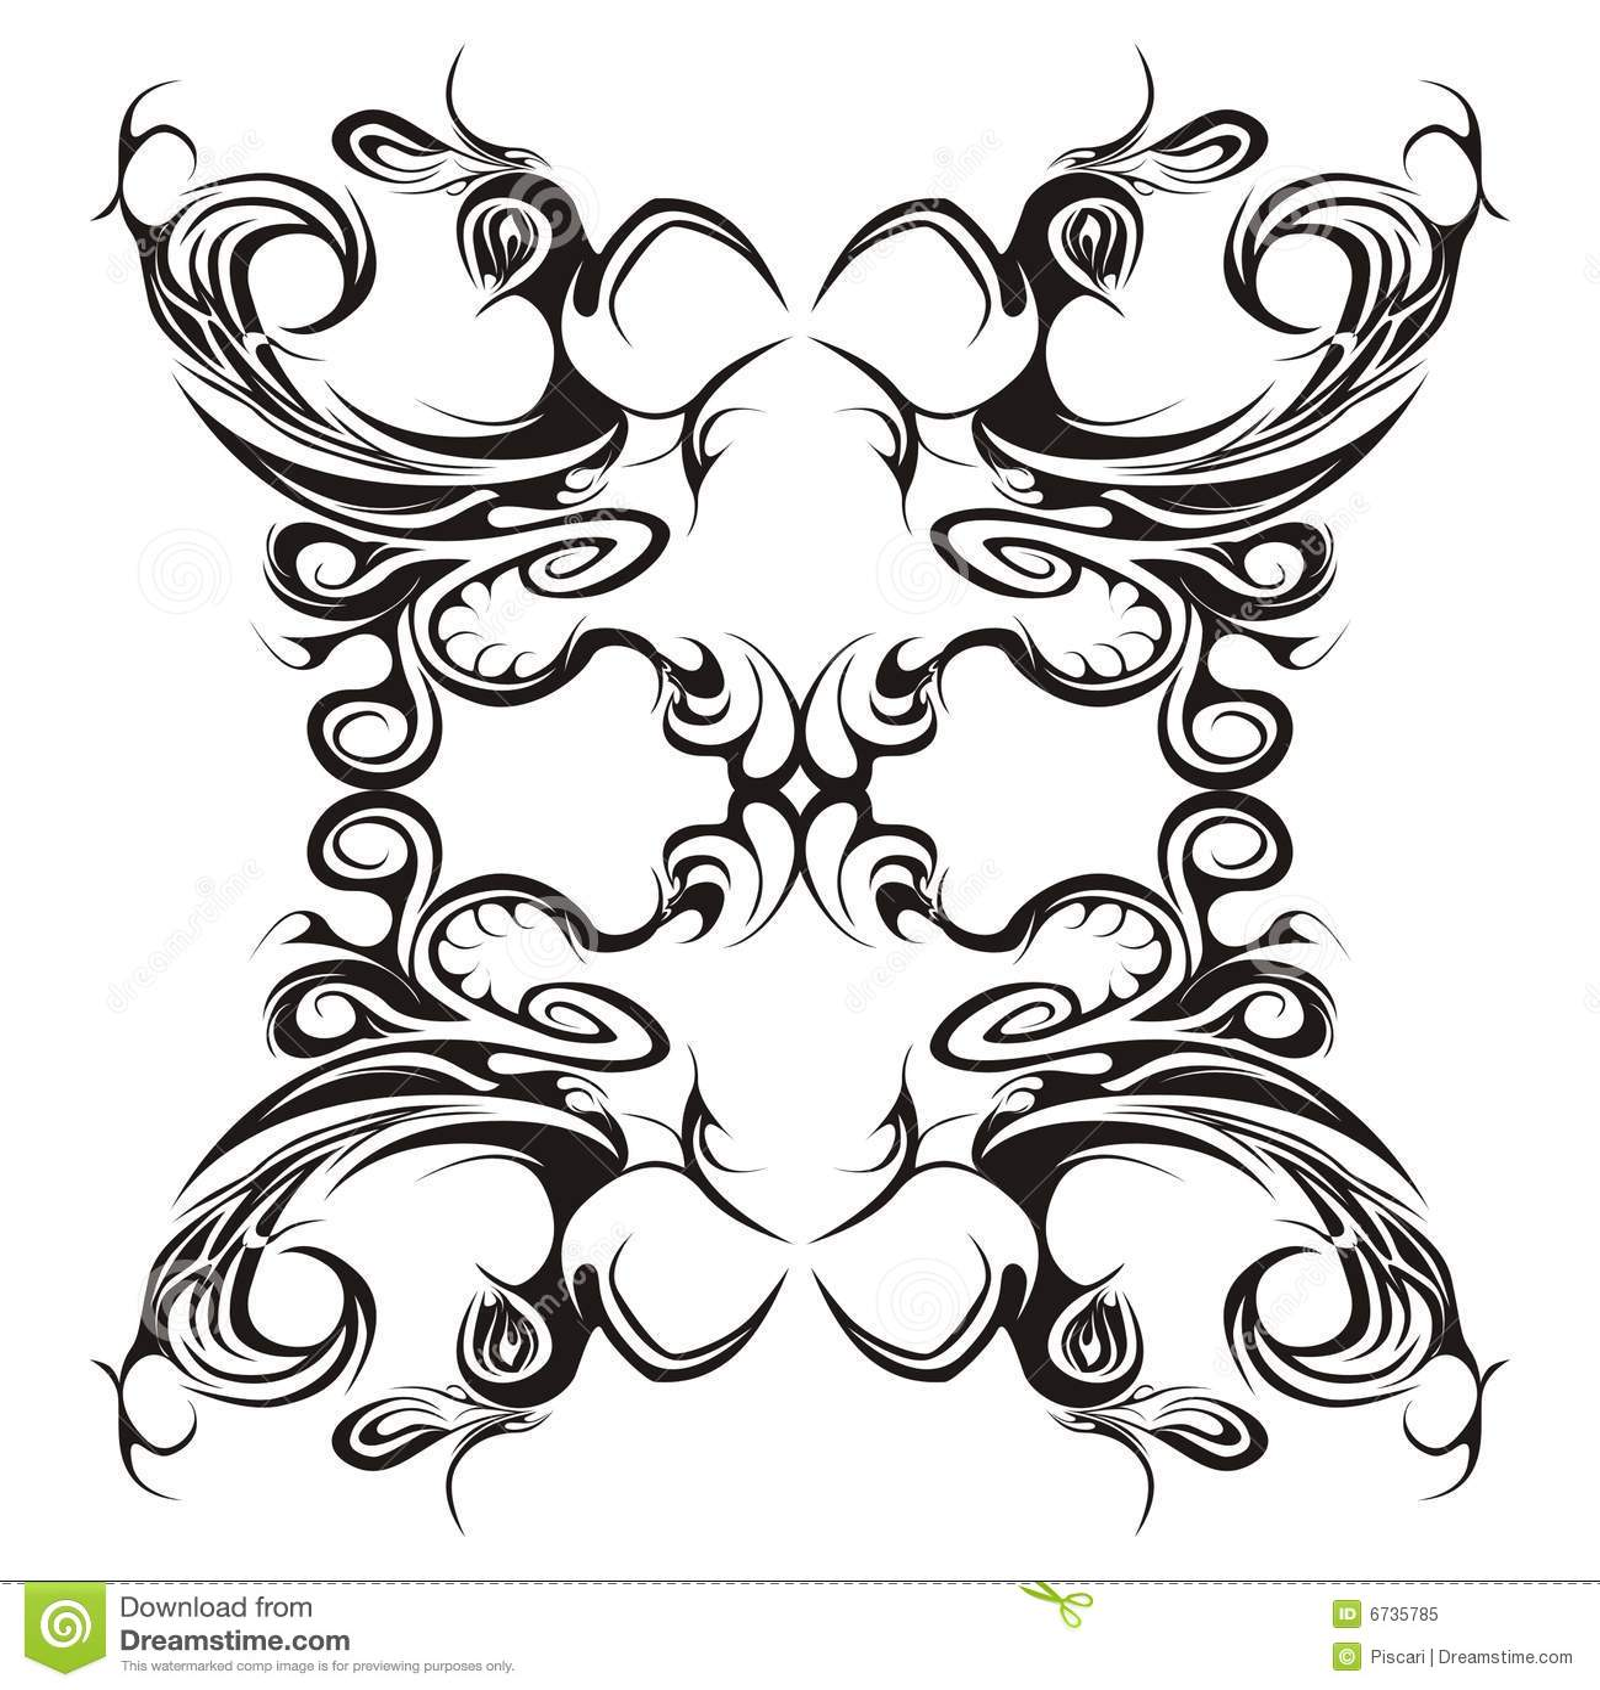 symmetrical floral design royalty free stock photo image 6735785. Black Bedroom Furniture Sets. Home Design Ideas